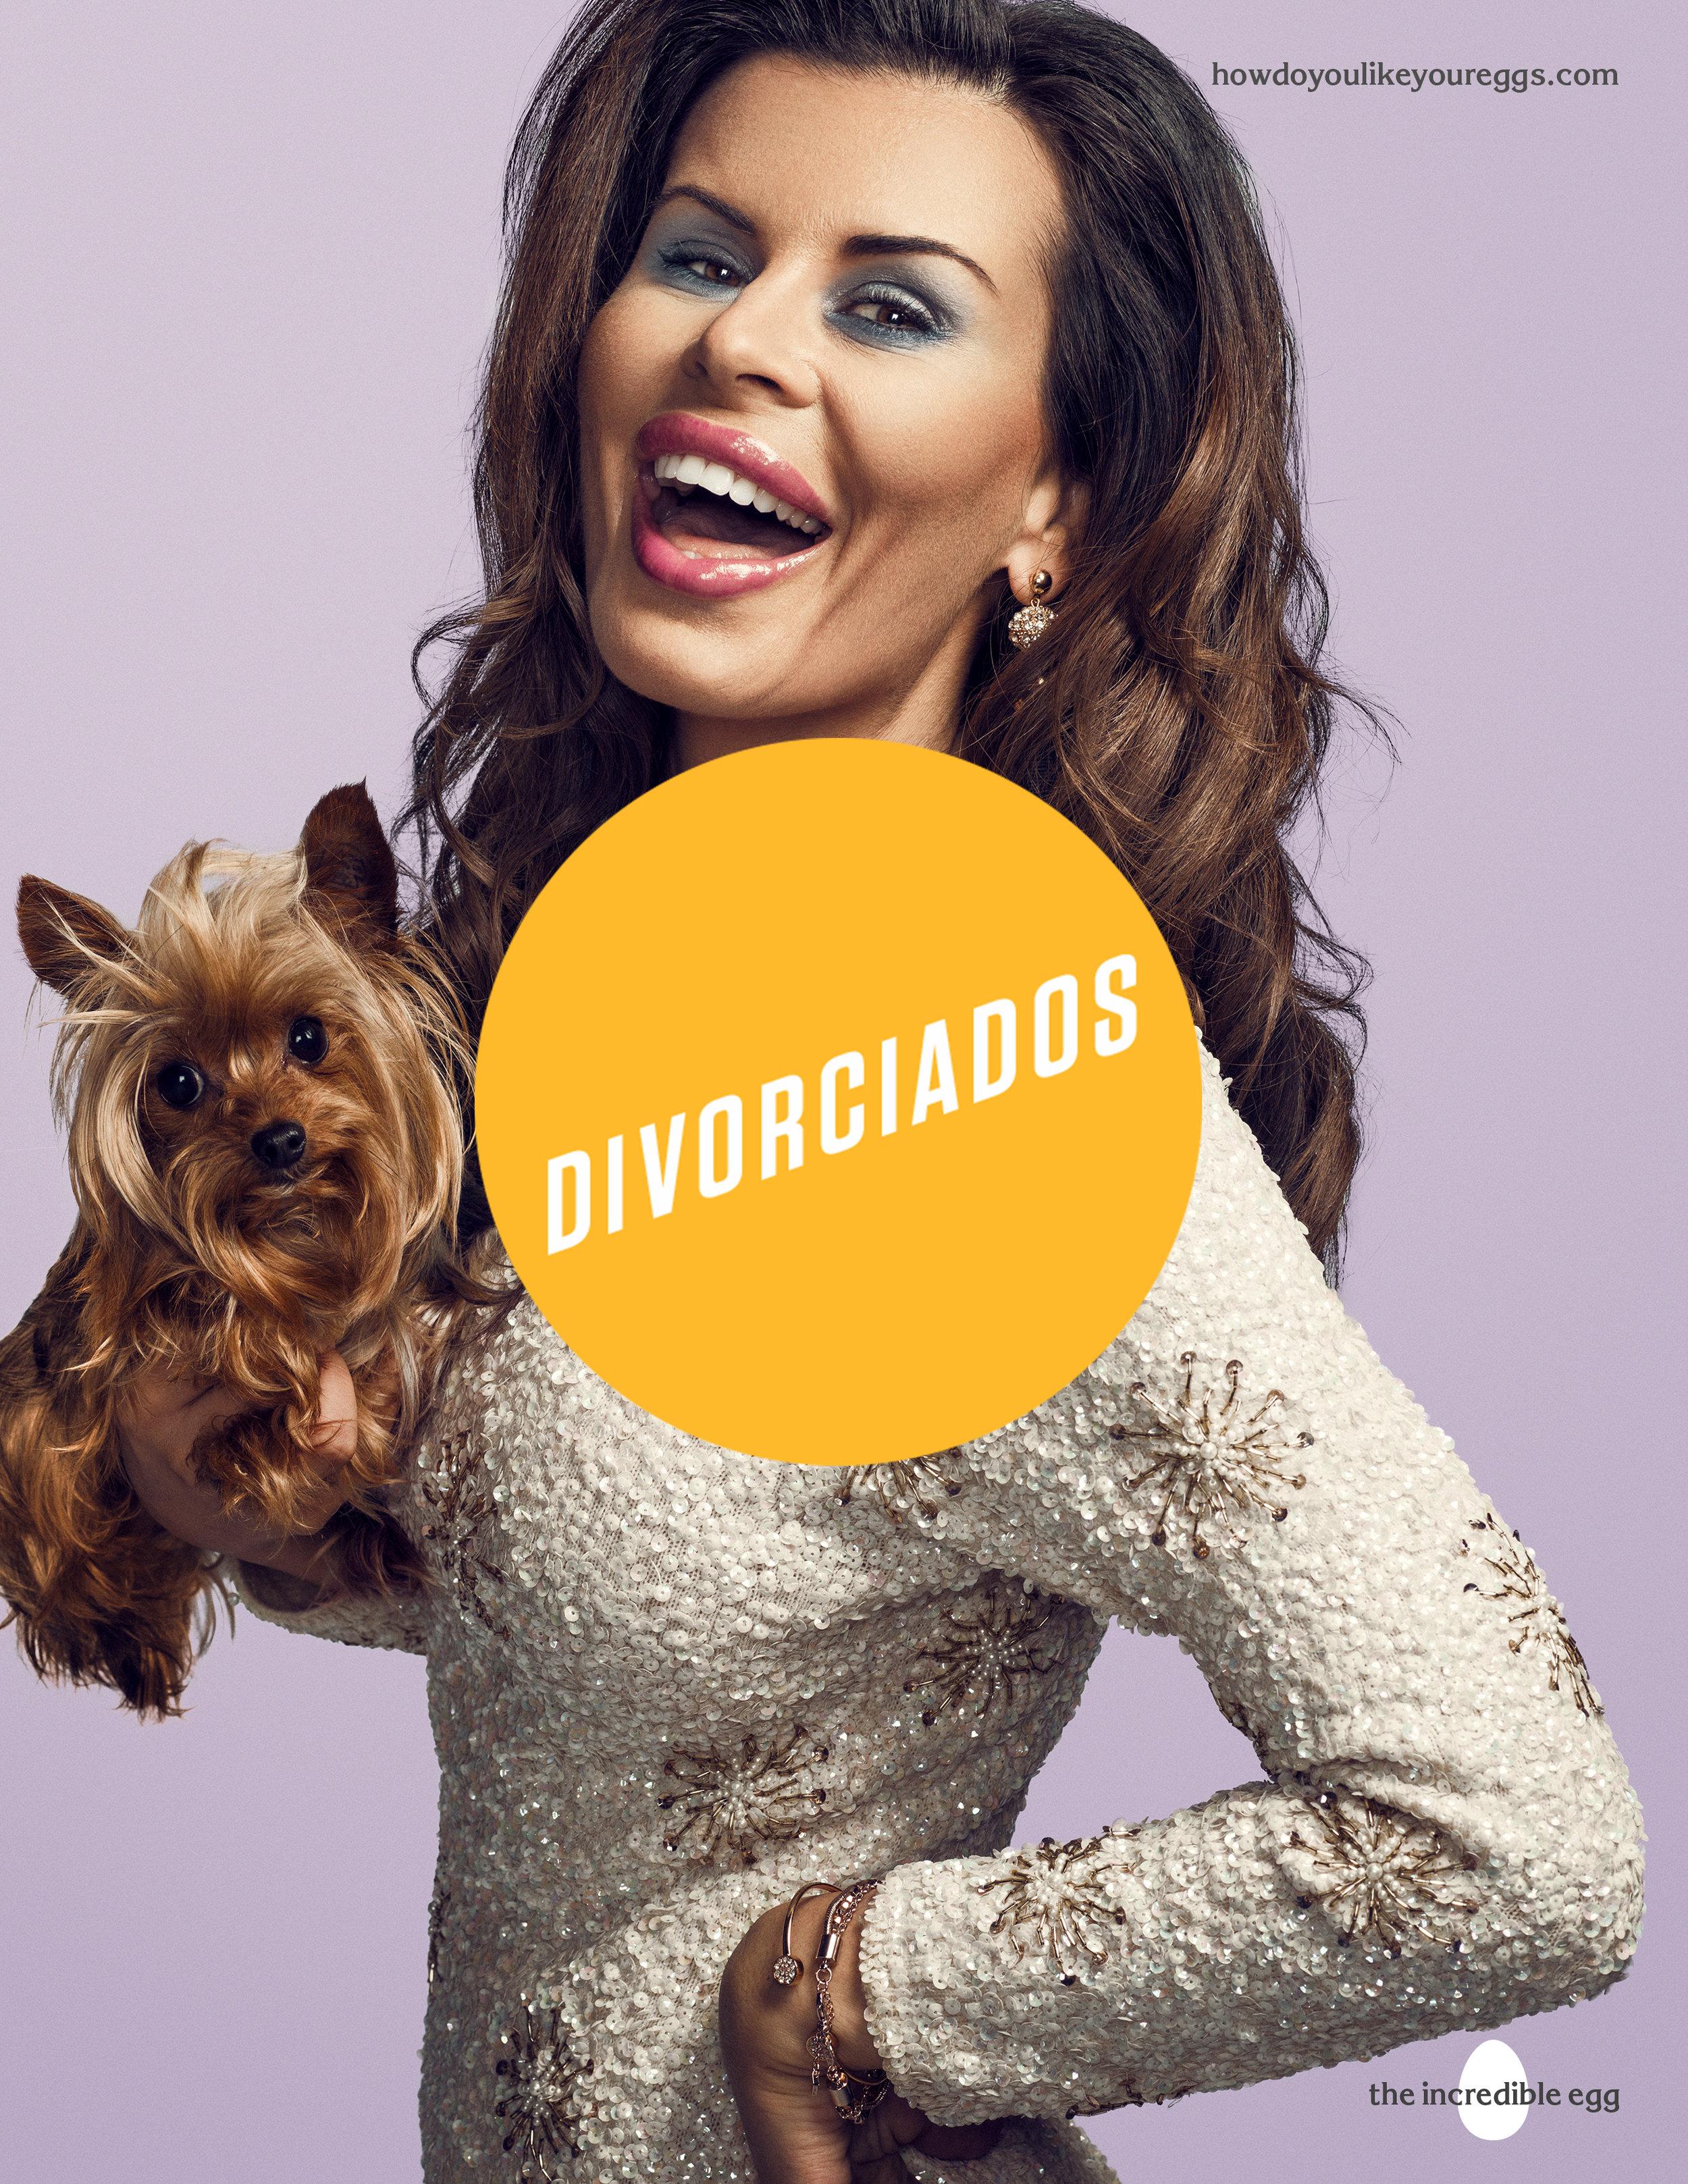 Divorciados_Print.jpg